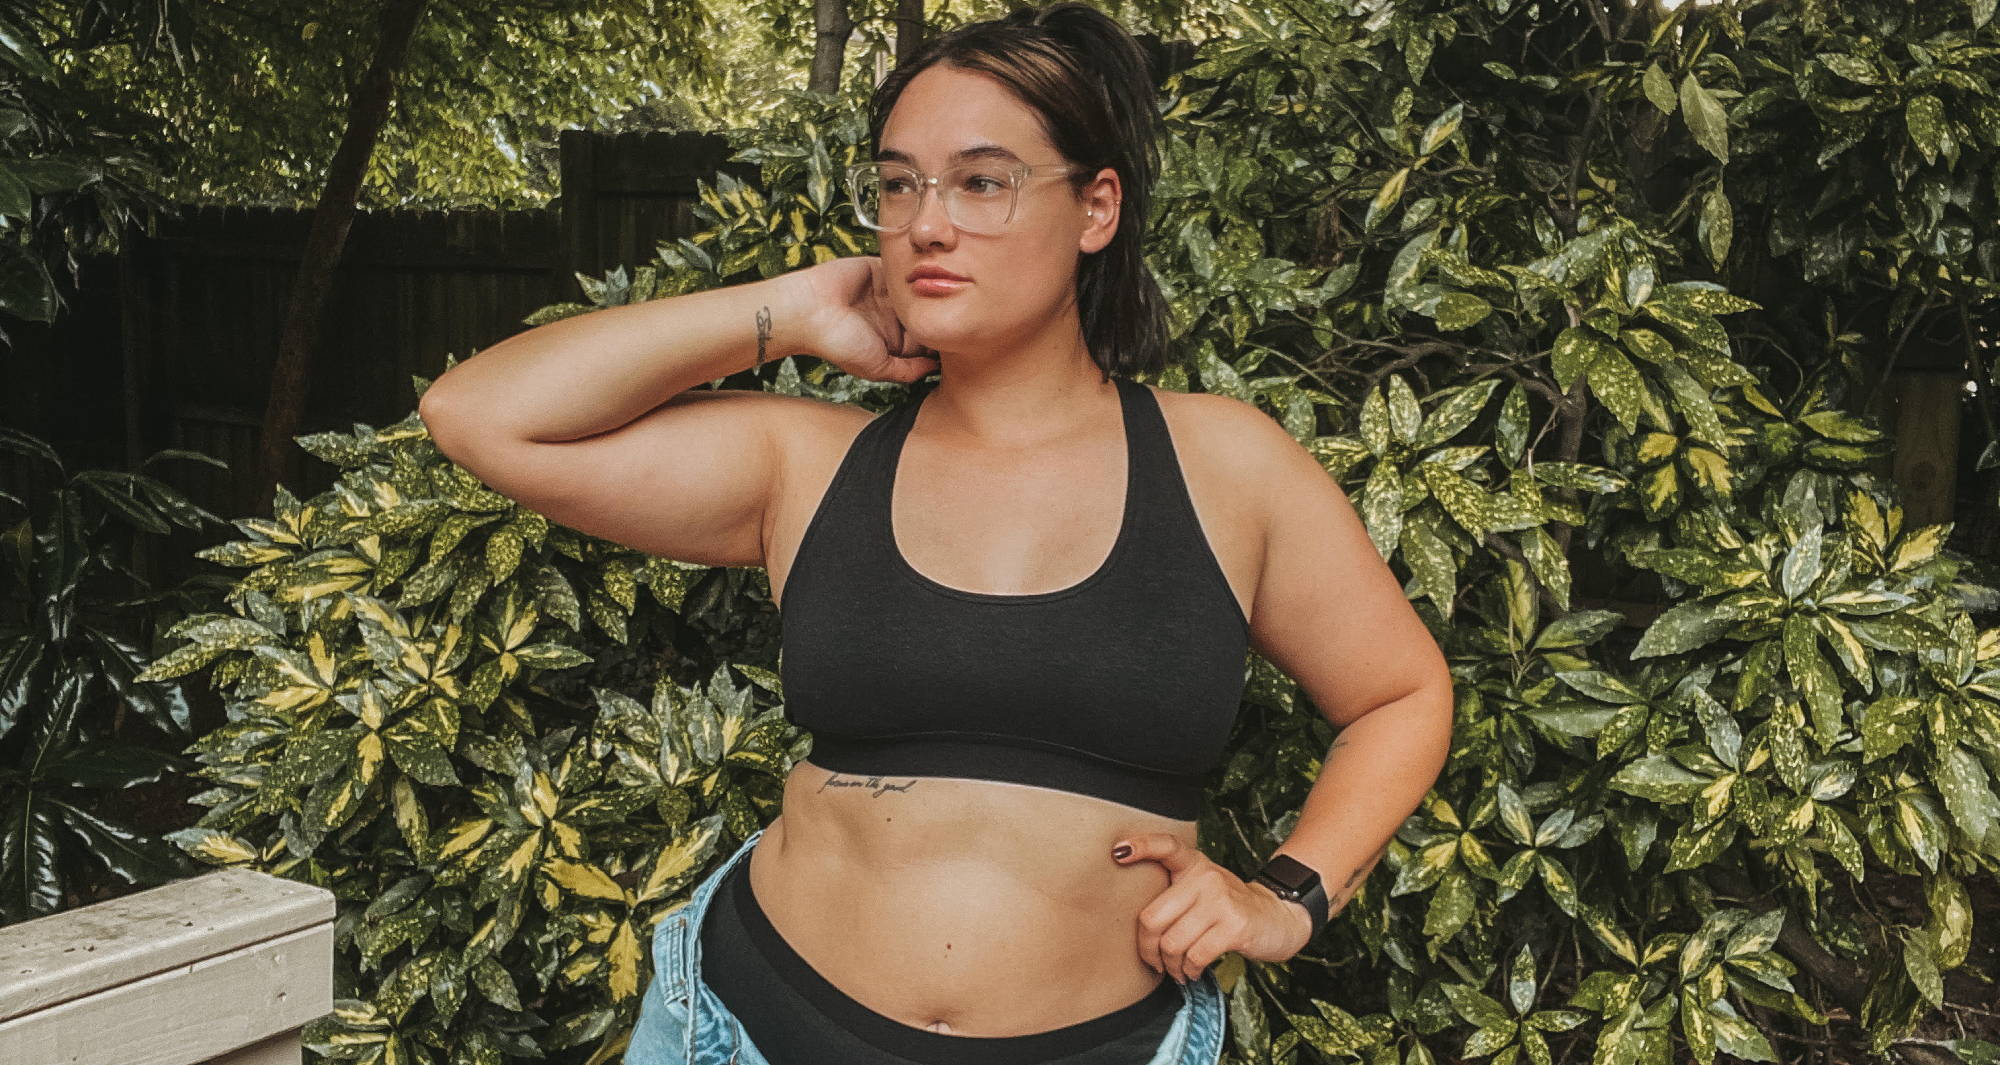 A woman celebrates World Vegan Day by wearing sustainable hemp underwear from WAMA